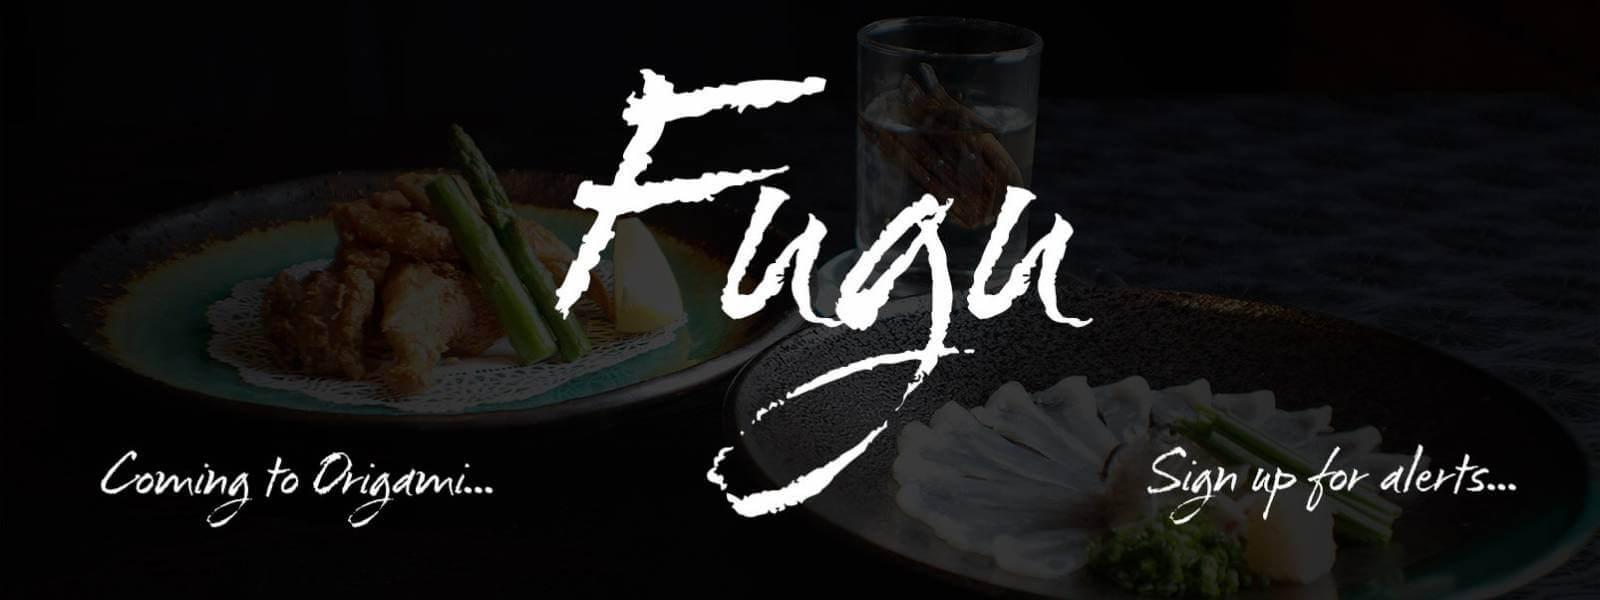 Get Fugu Alerts